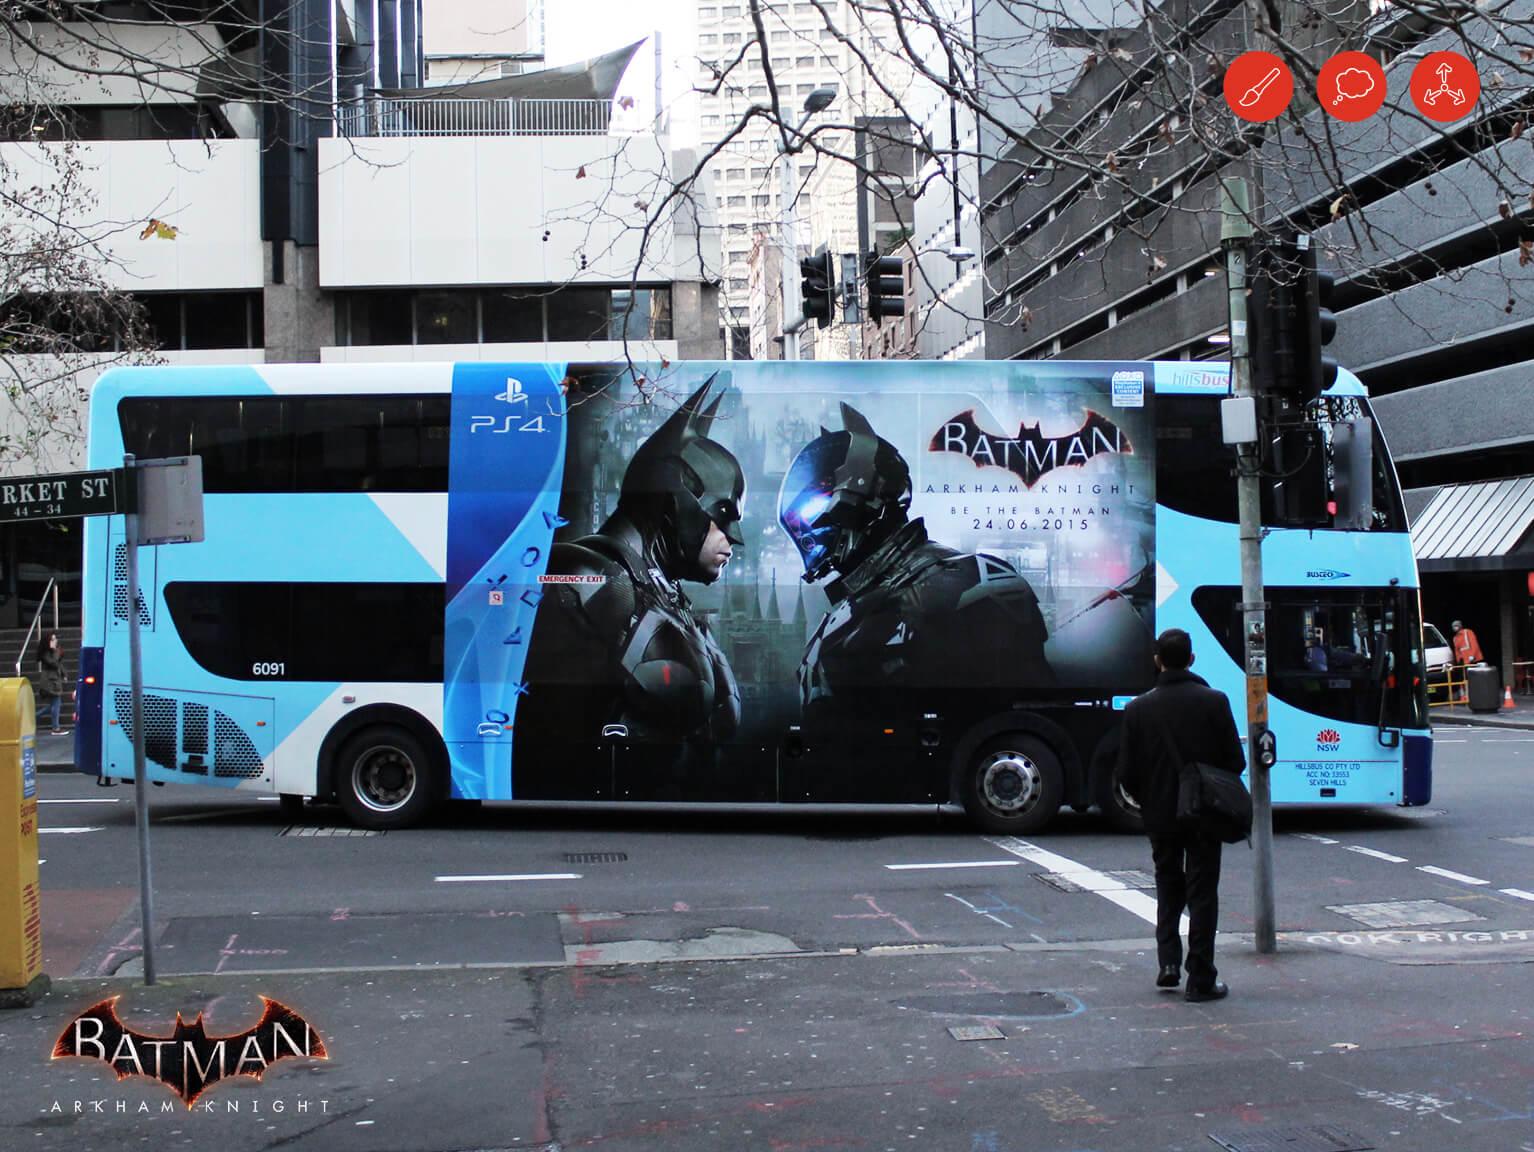 Batman Arkham Knight bus advertising